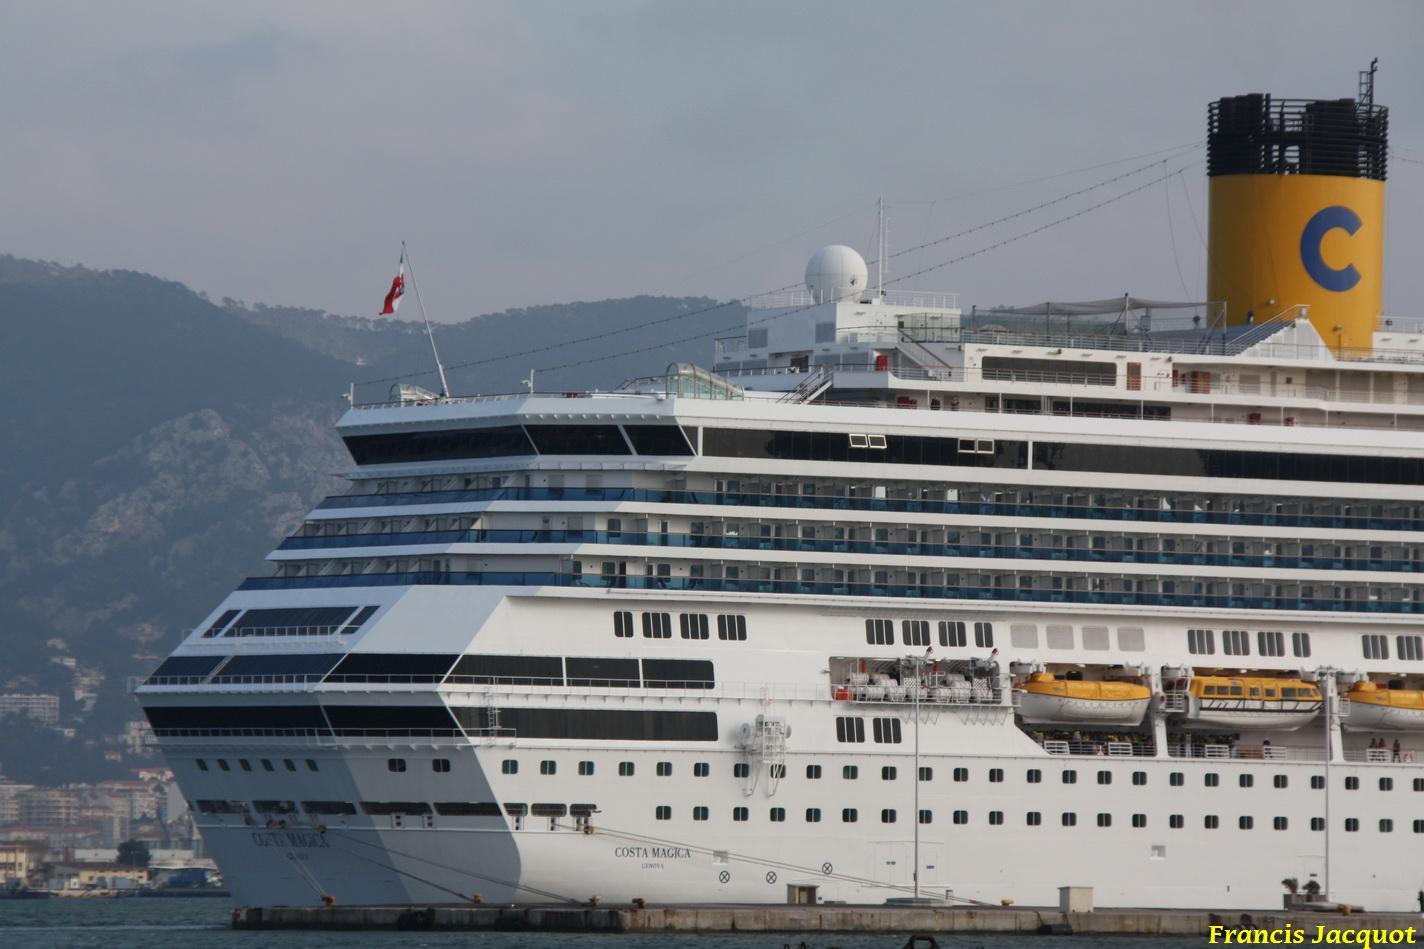 Le Costa Magica en escale à La Seyne sur Mer 0314